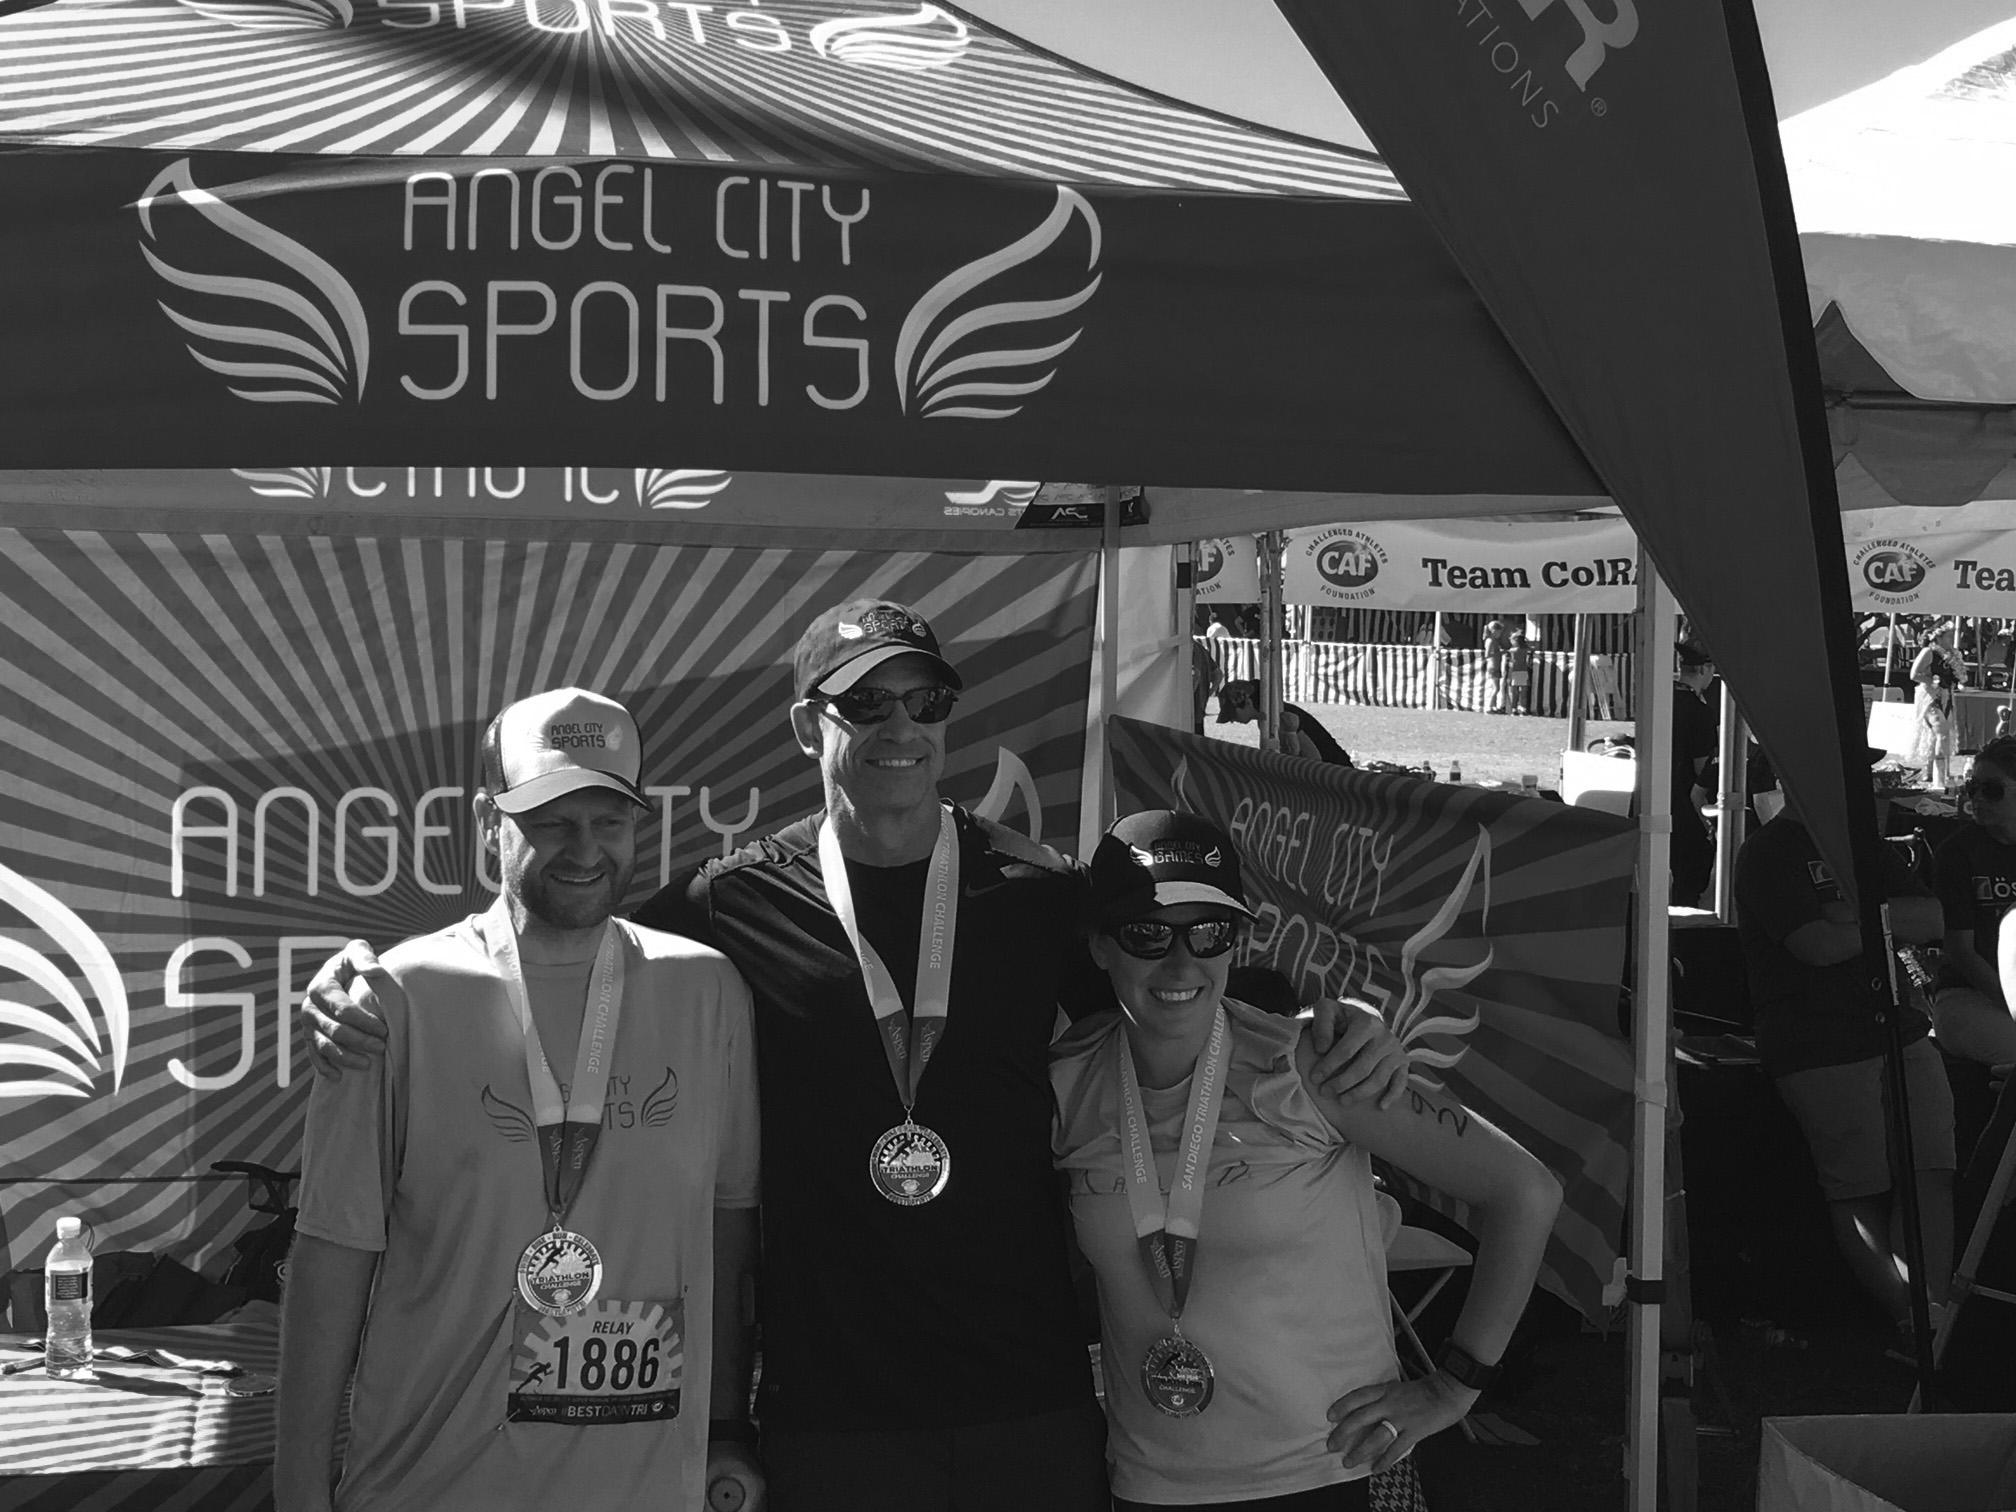 Angel City Sports Rely Team-bw.jpg